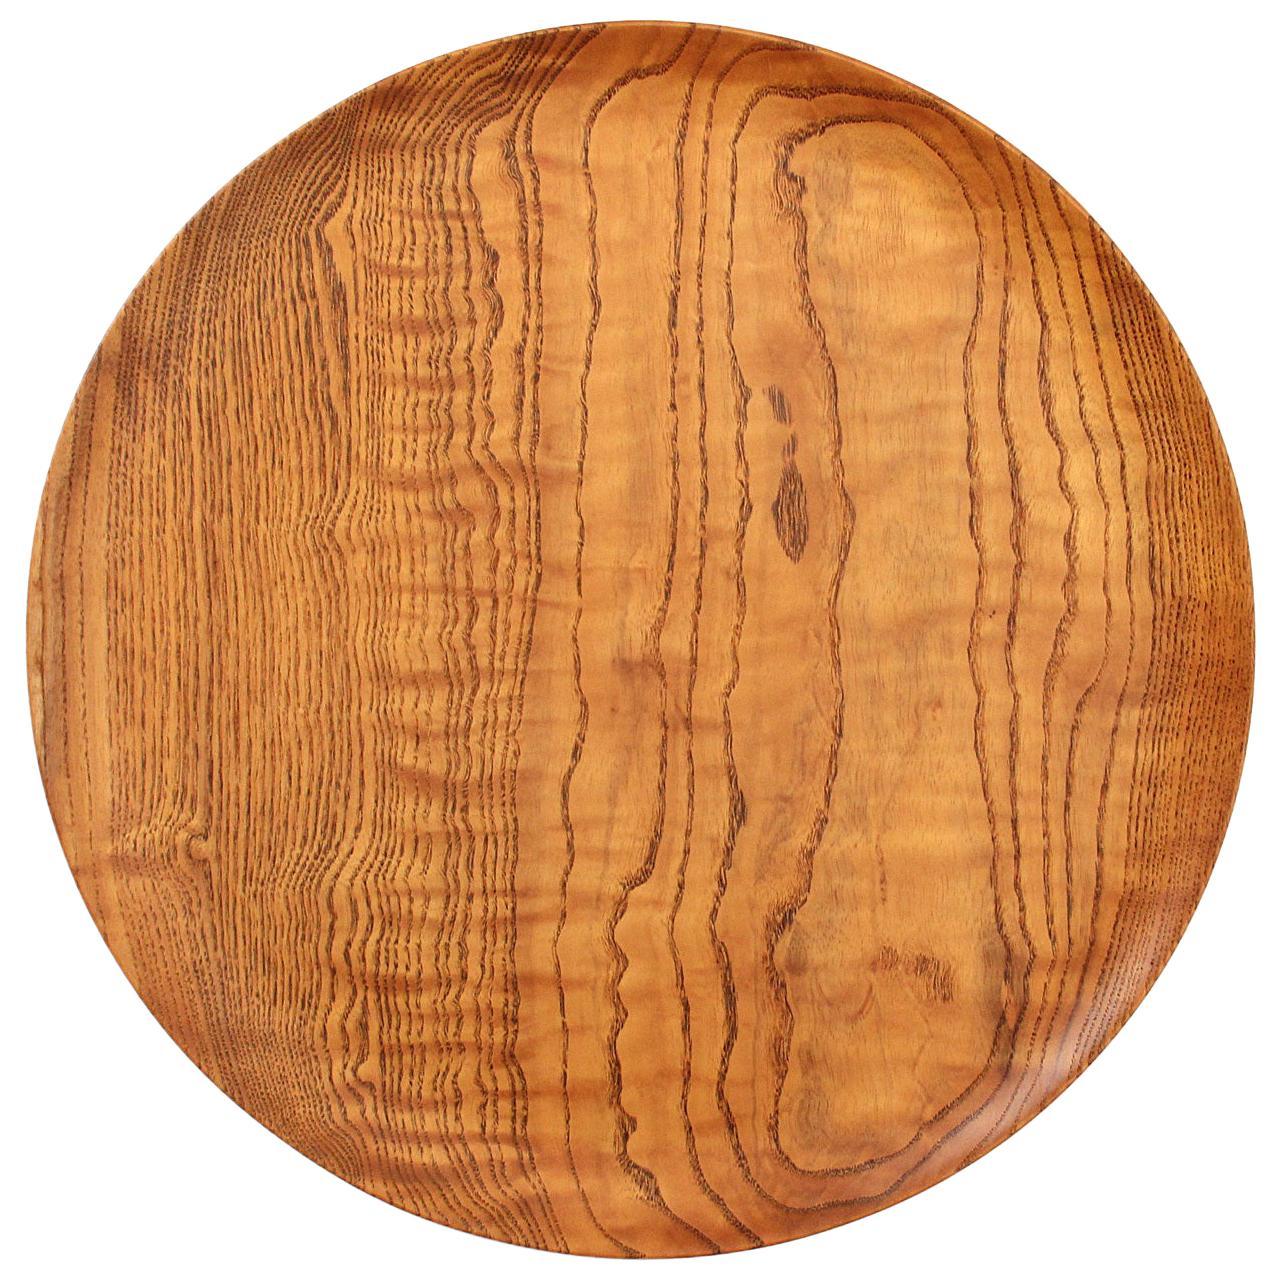 Turned Ash Platter by Bob Stocksdale